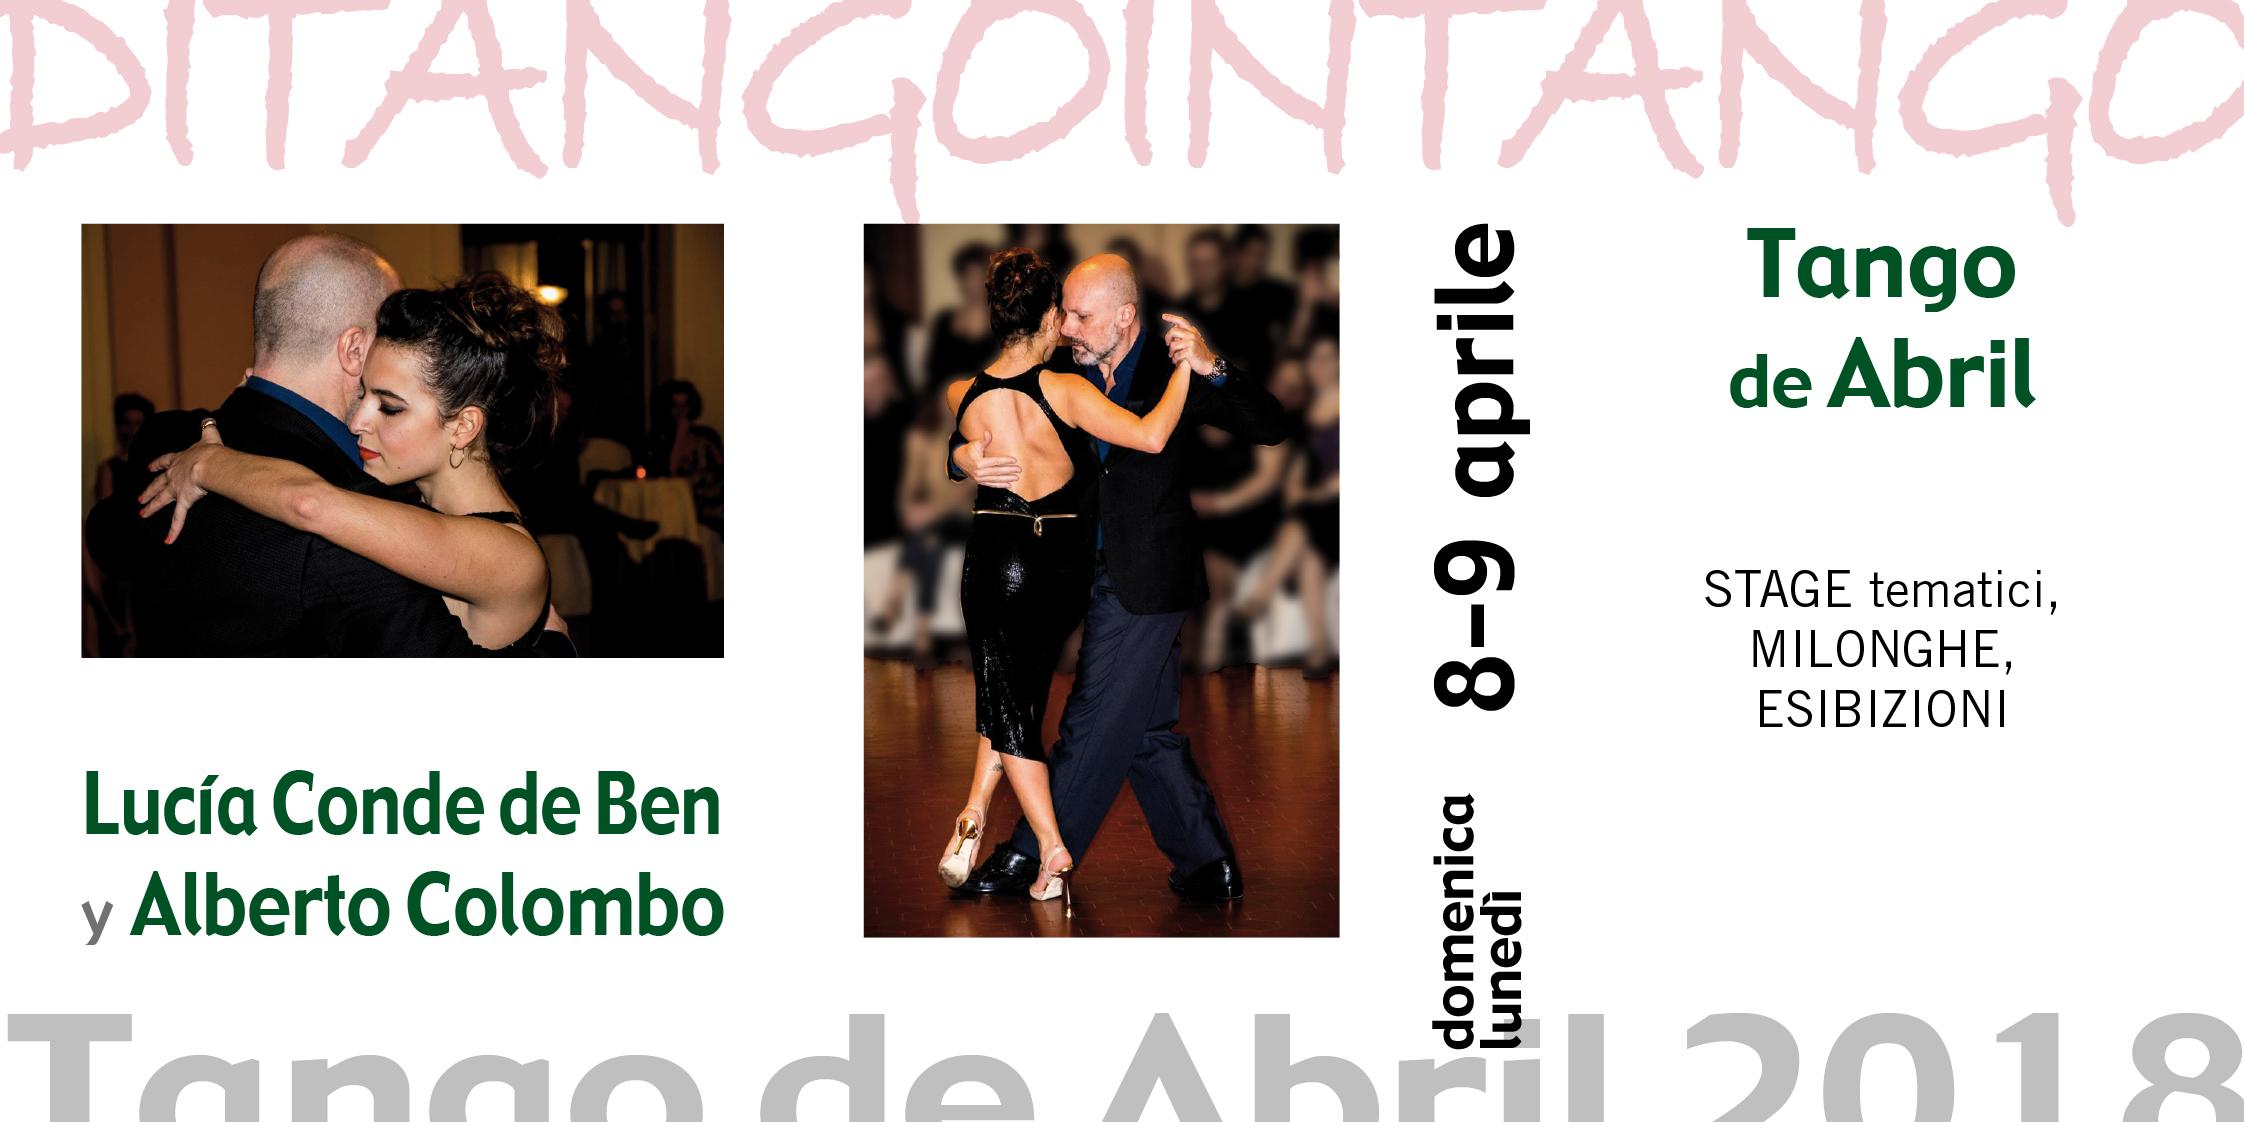 Tango de Abril Lucia Conde De Ben y Alberto Colombo